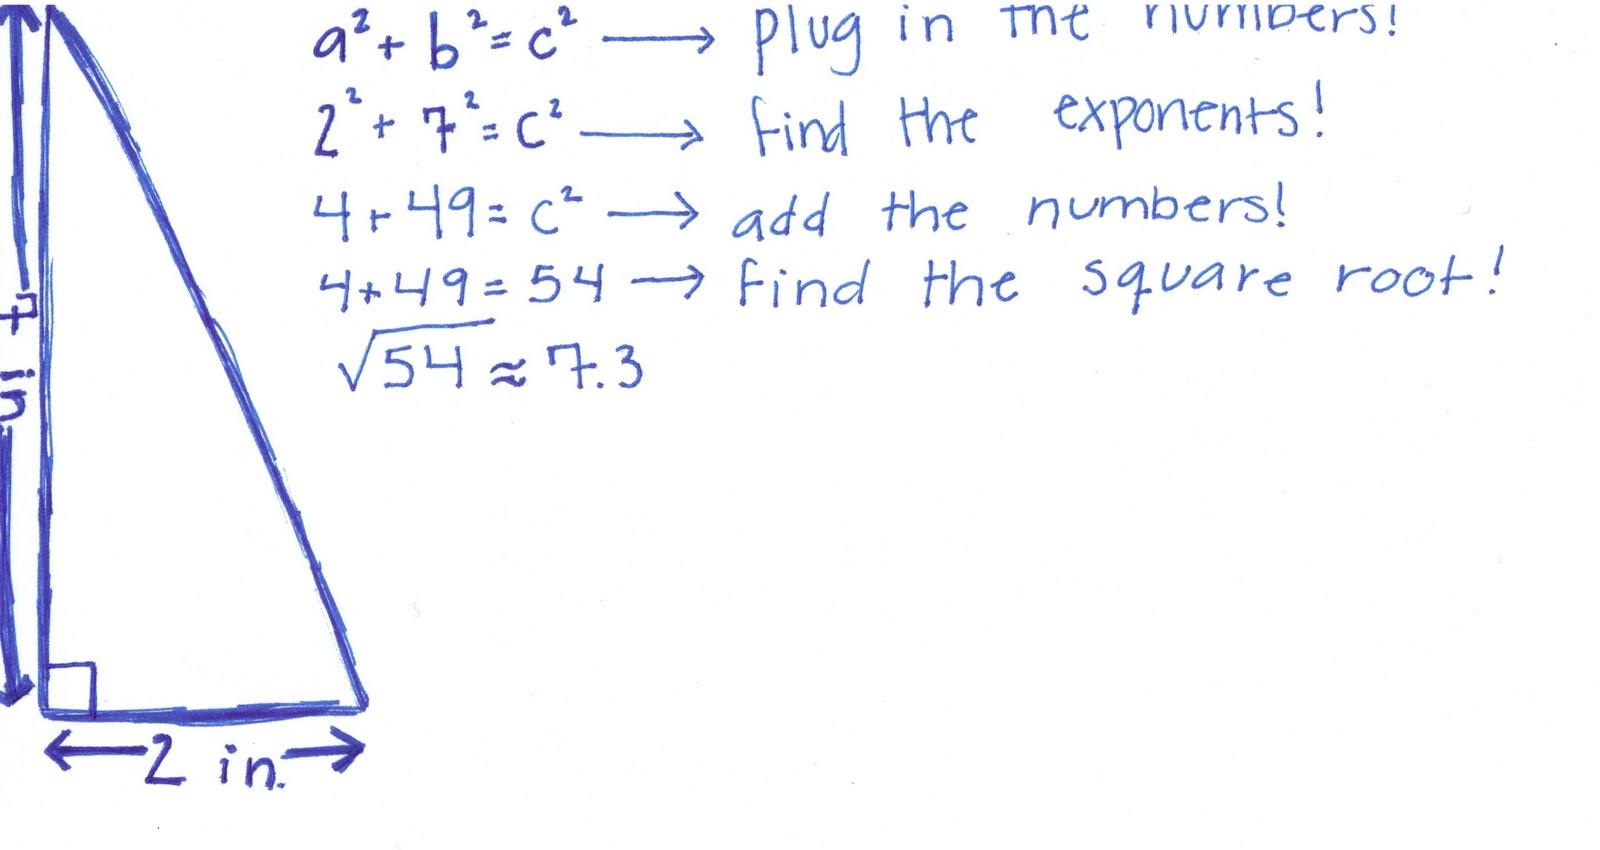 worksheet Pythagorean Theorem Word Problems Duliziyou Worksheets – Pythagorean Theorem Problems Worksheet